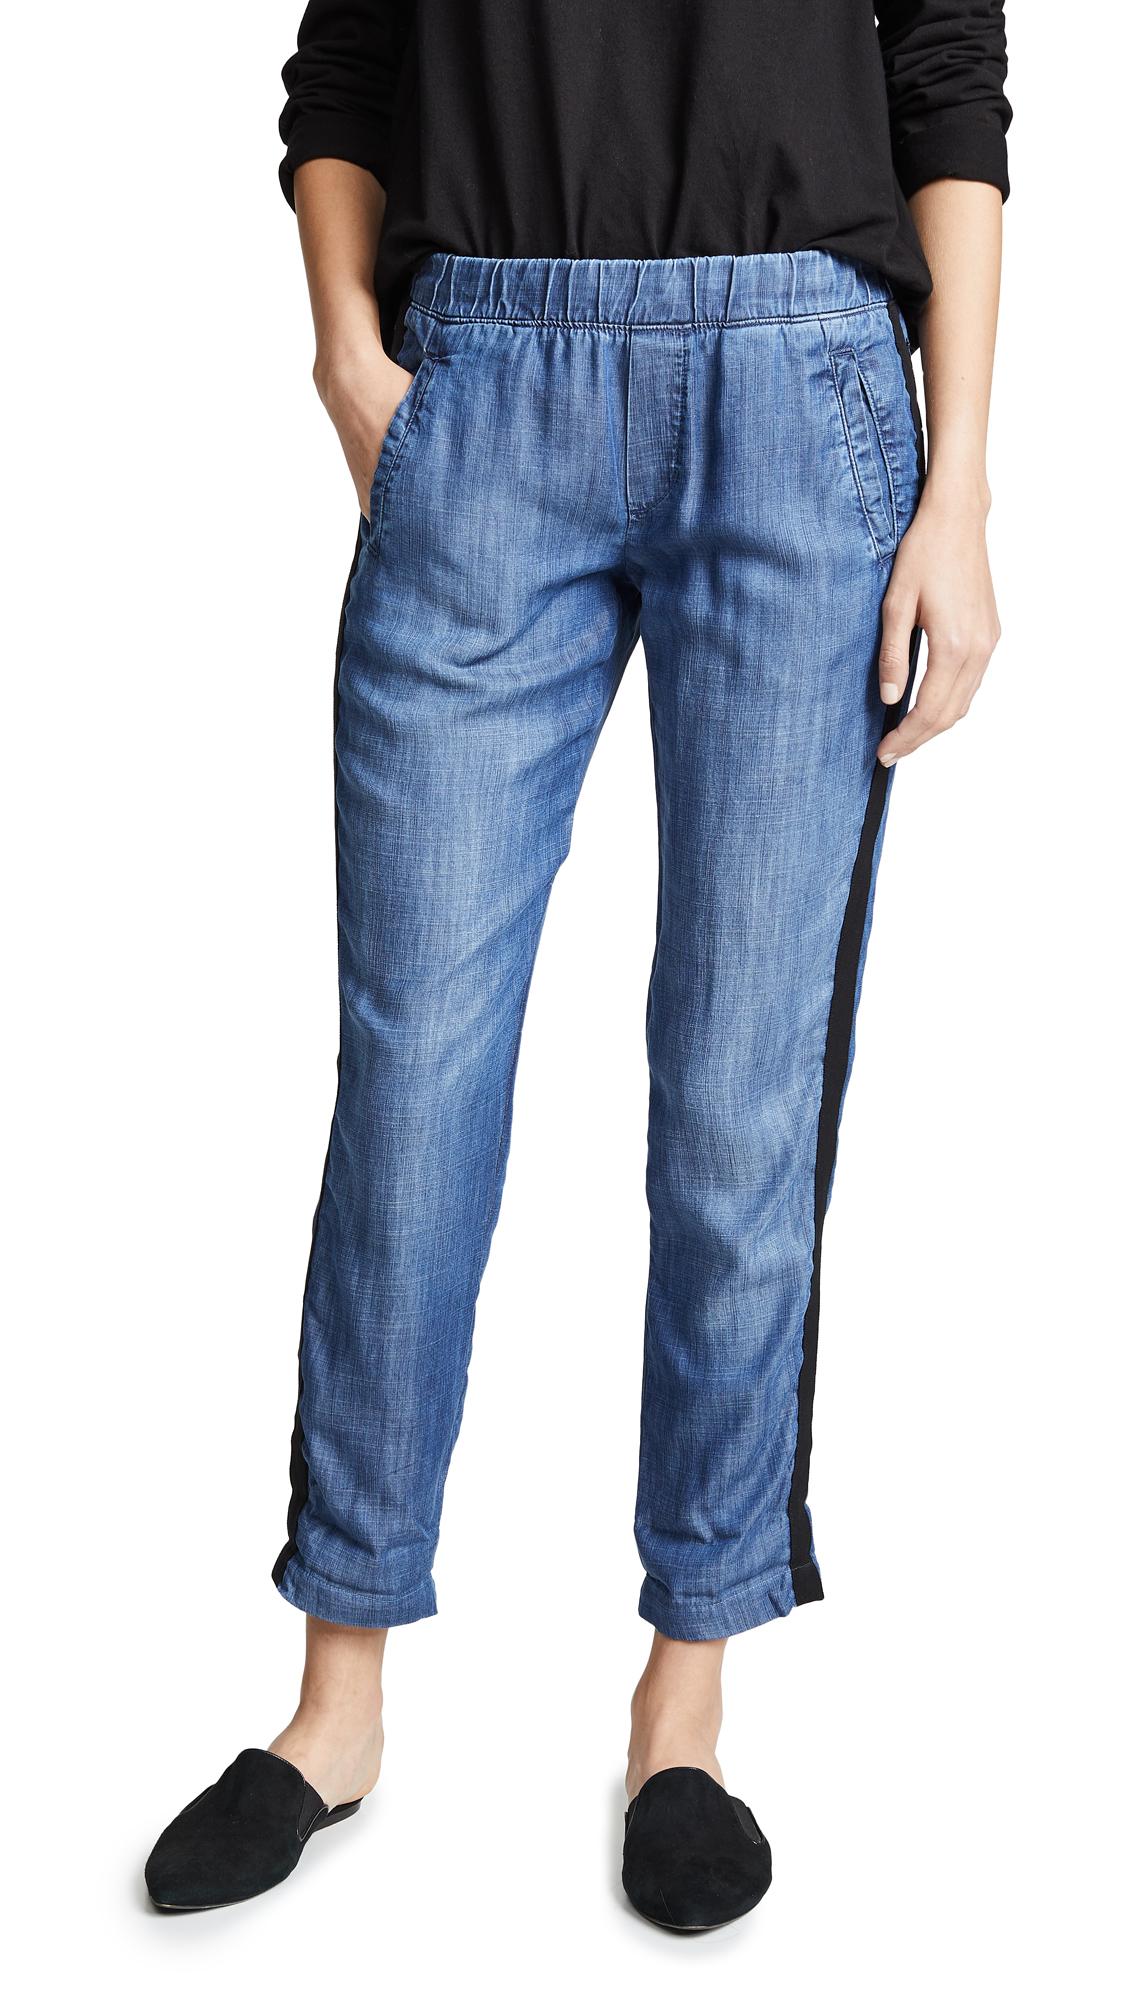 Bella Dahl Welt Pocket Trousers - Beaumont